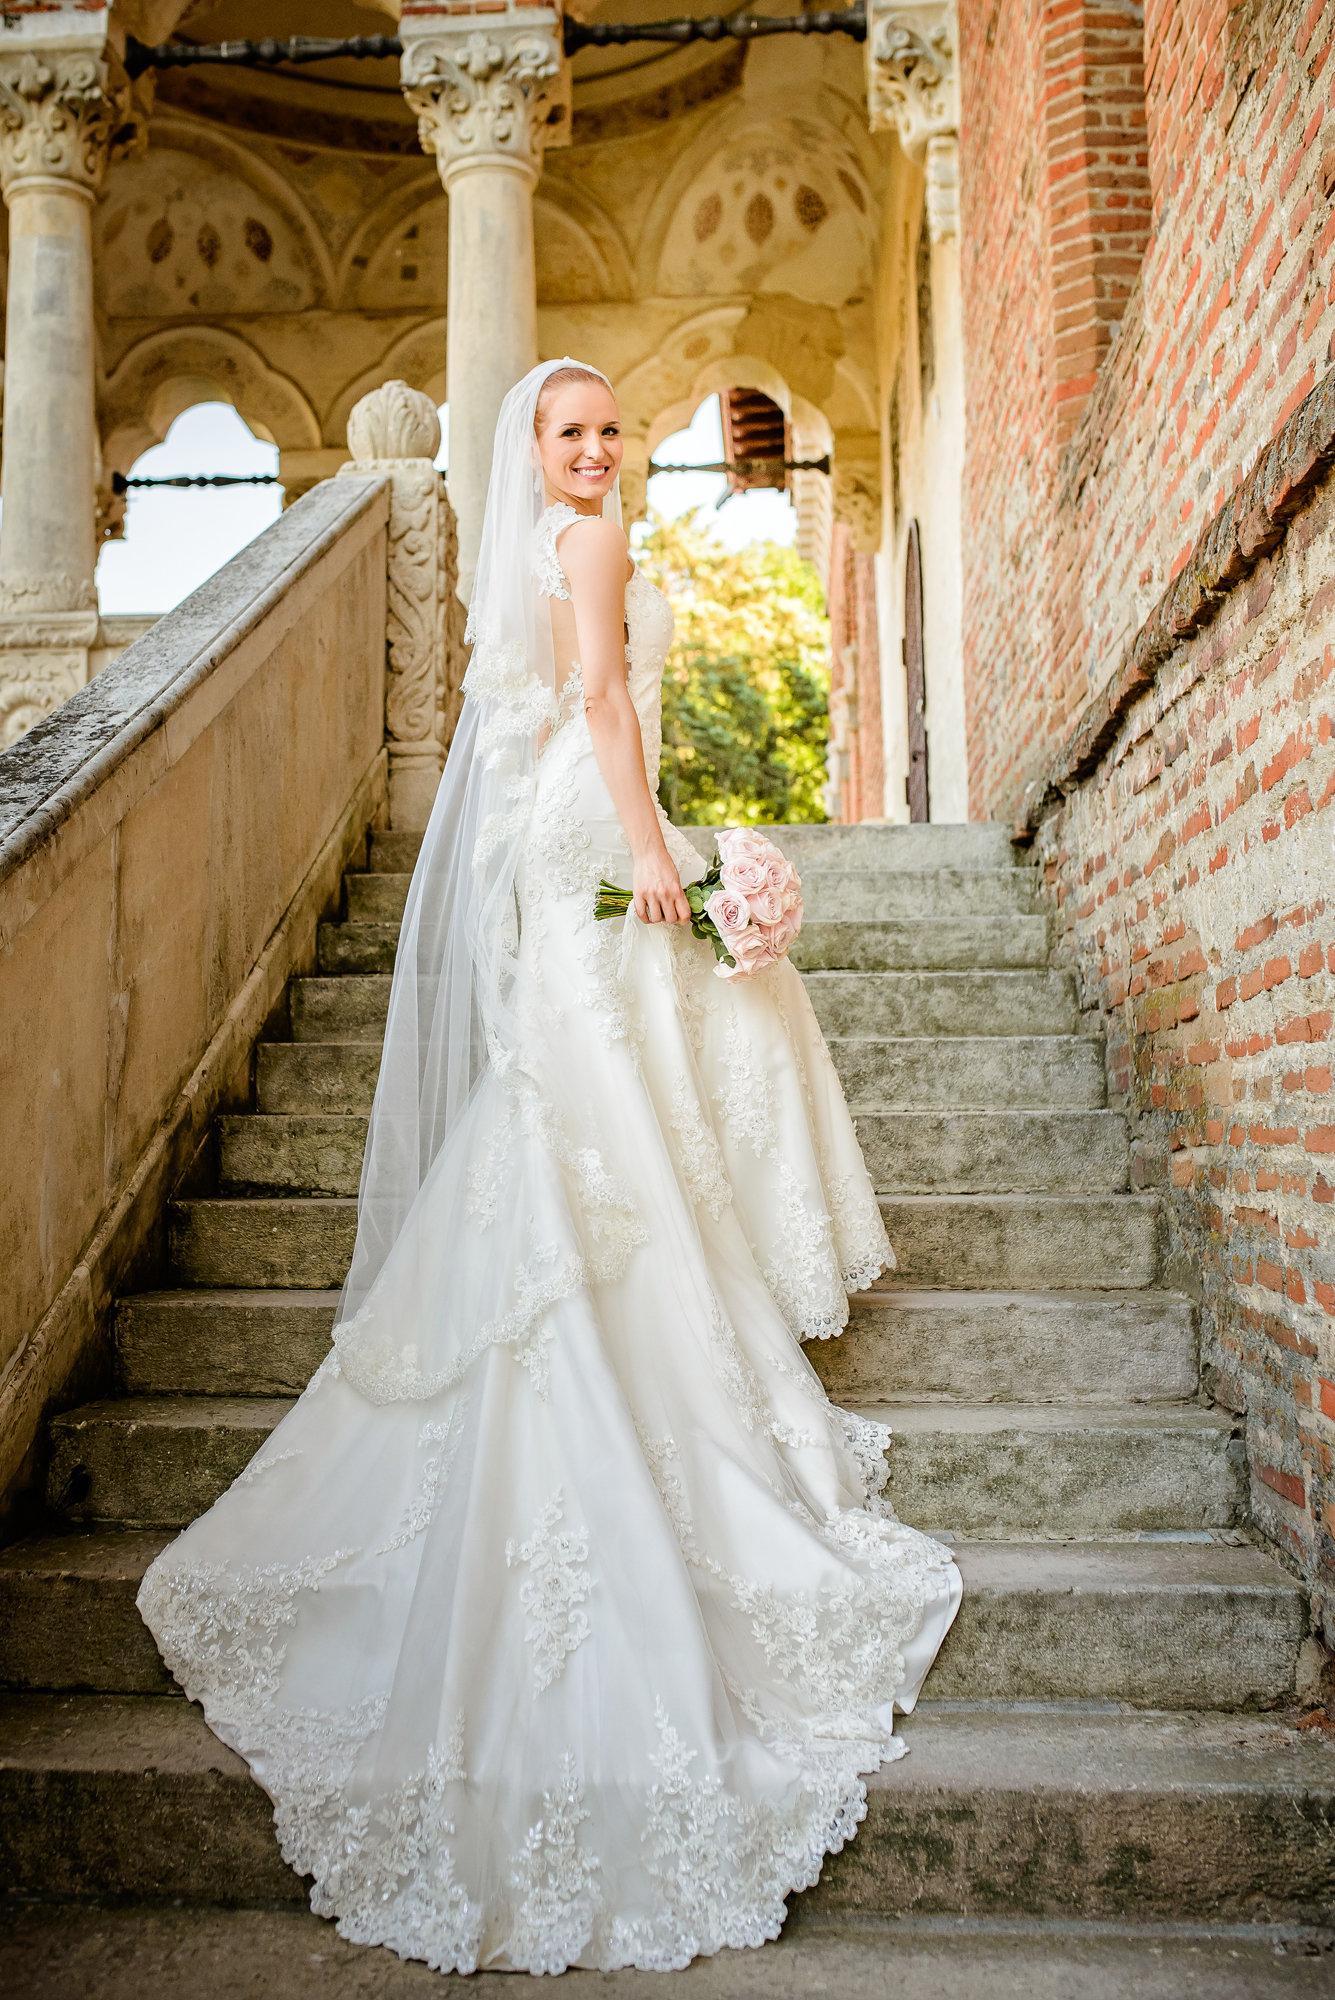 alexandru madalina wedding day 37